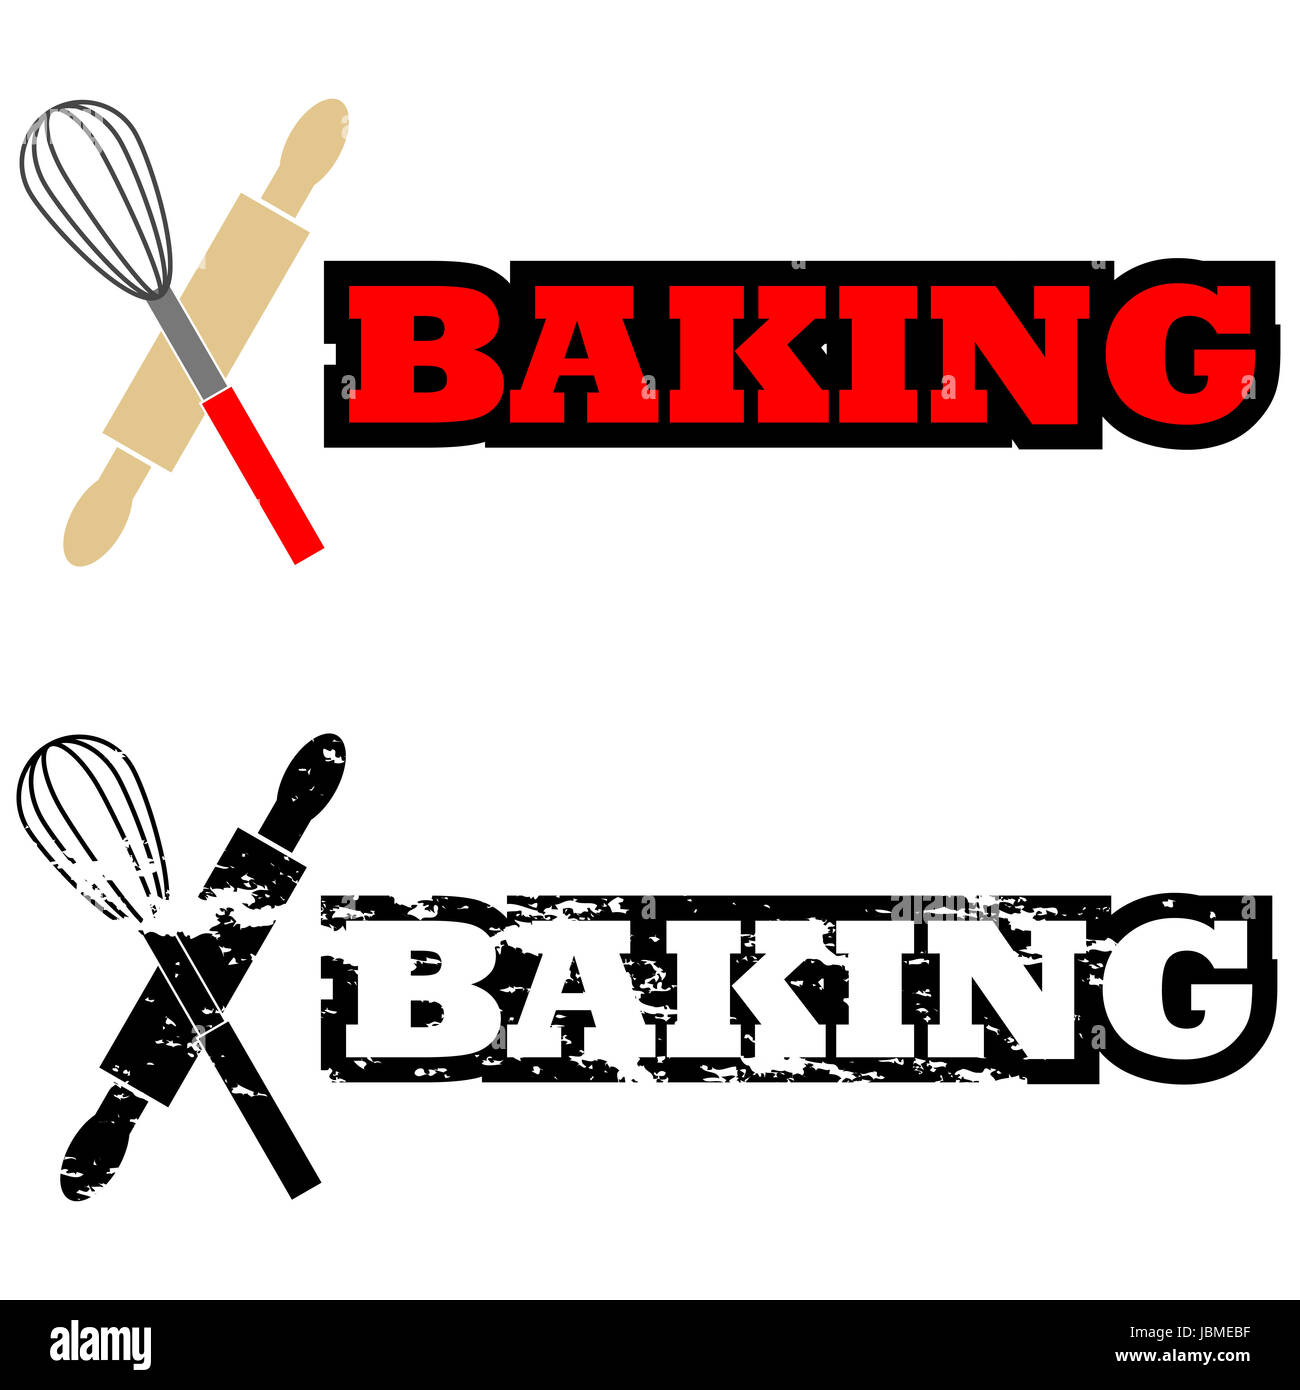 Dessert Icon Graphic Cook Stockfotos & Dessert Icon Graphic Cook ...